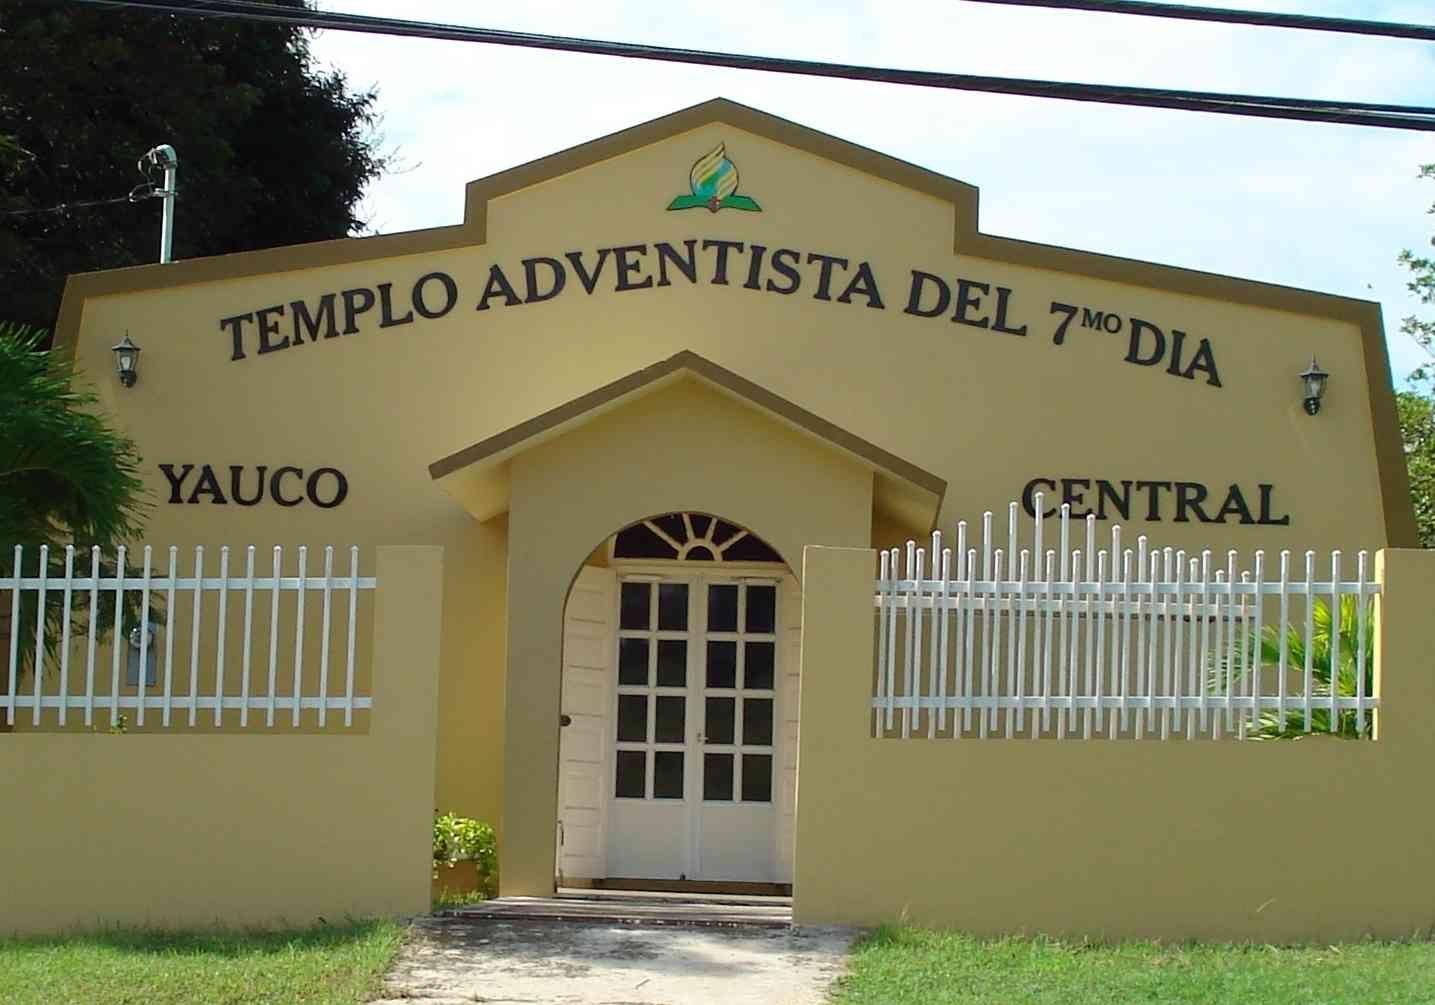 Iglesia Adventista del Séptimo Día - Home